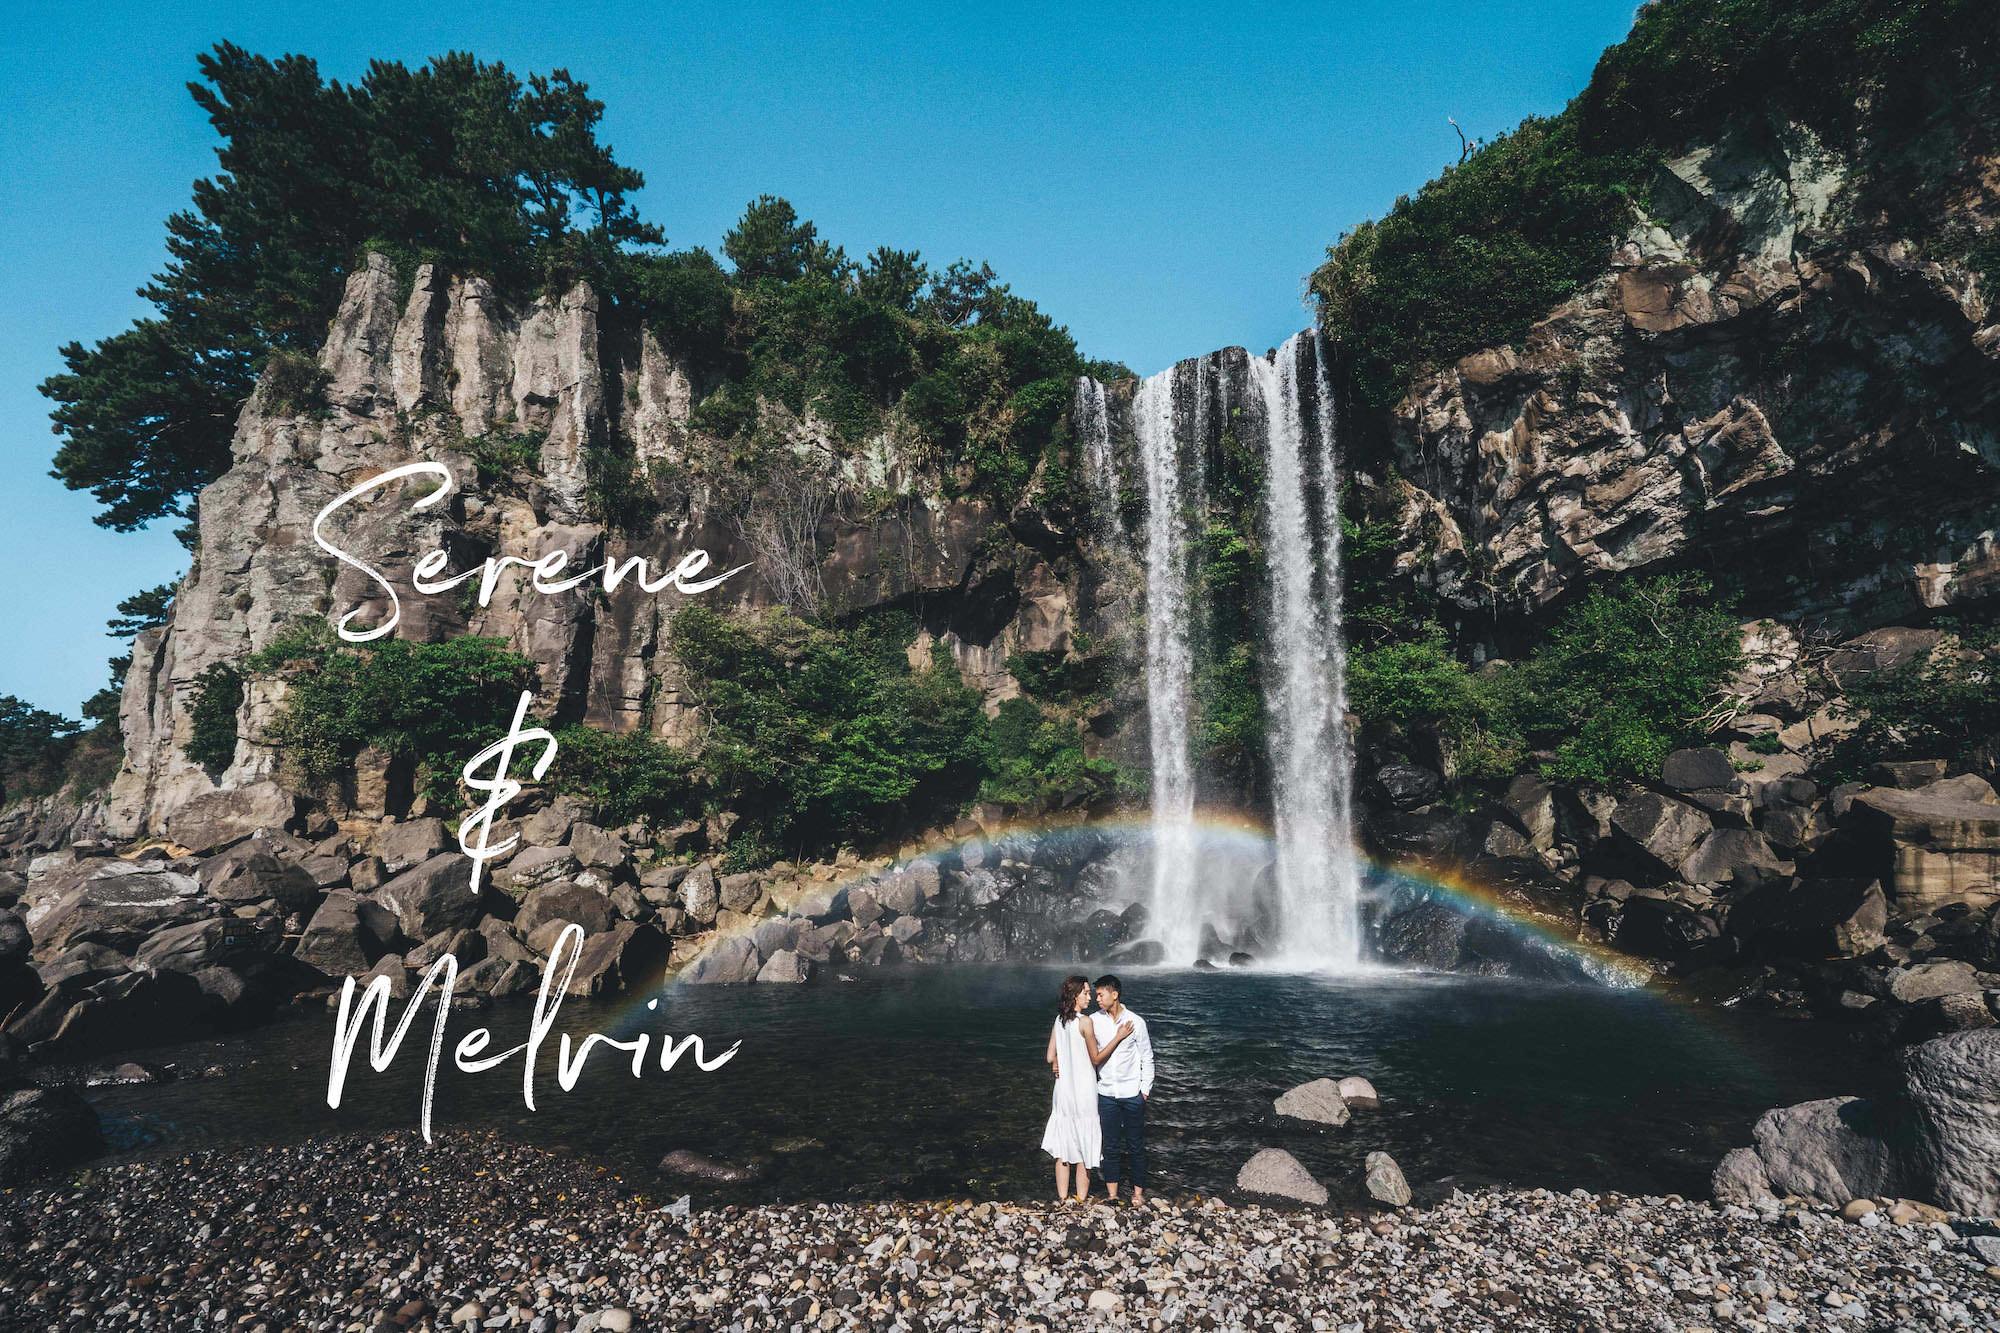 Serene & Melvin. - Korea Prewedding - 1.jpg